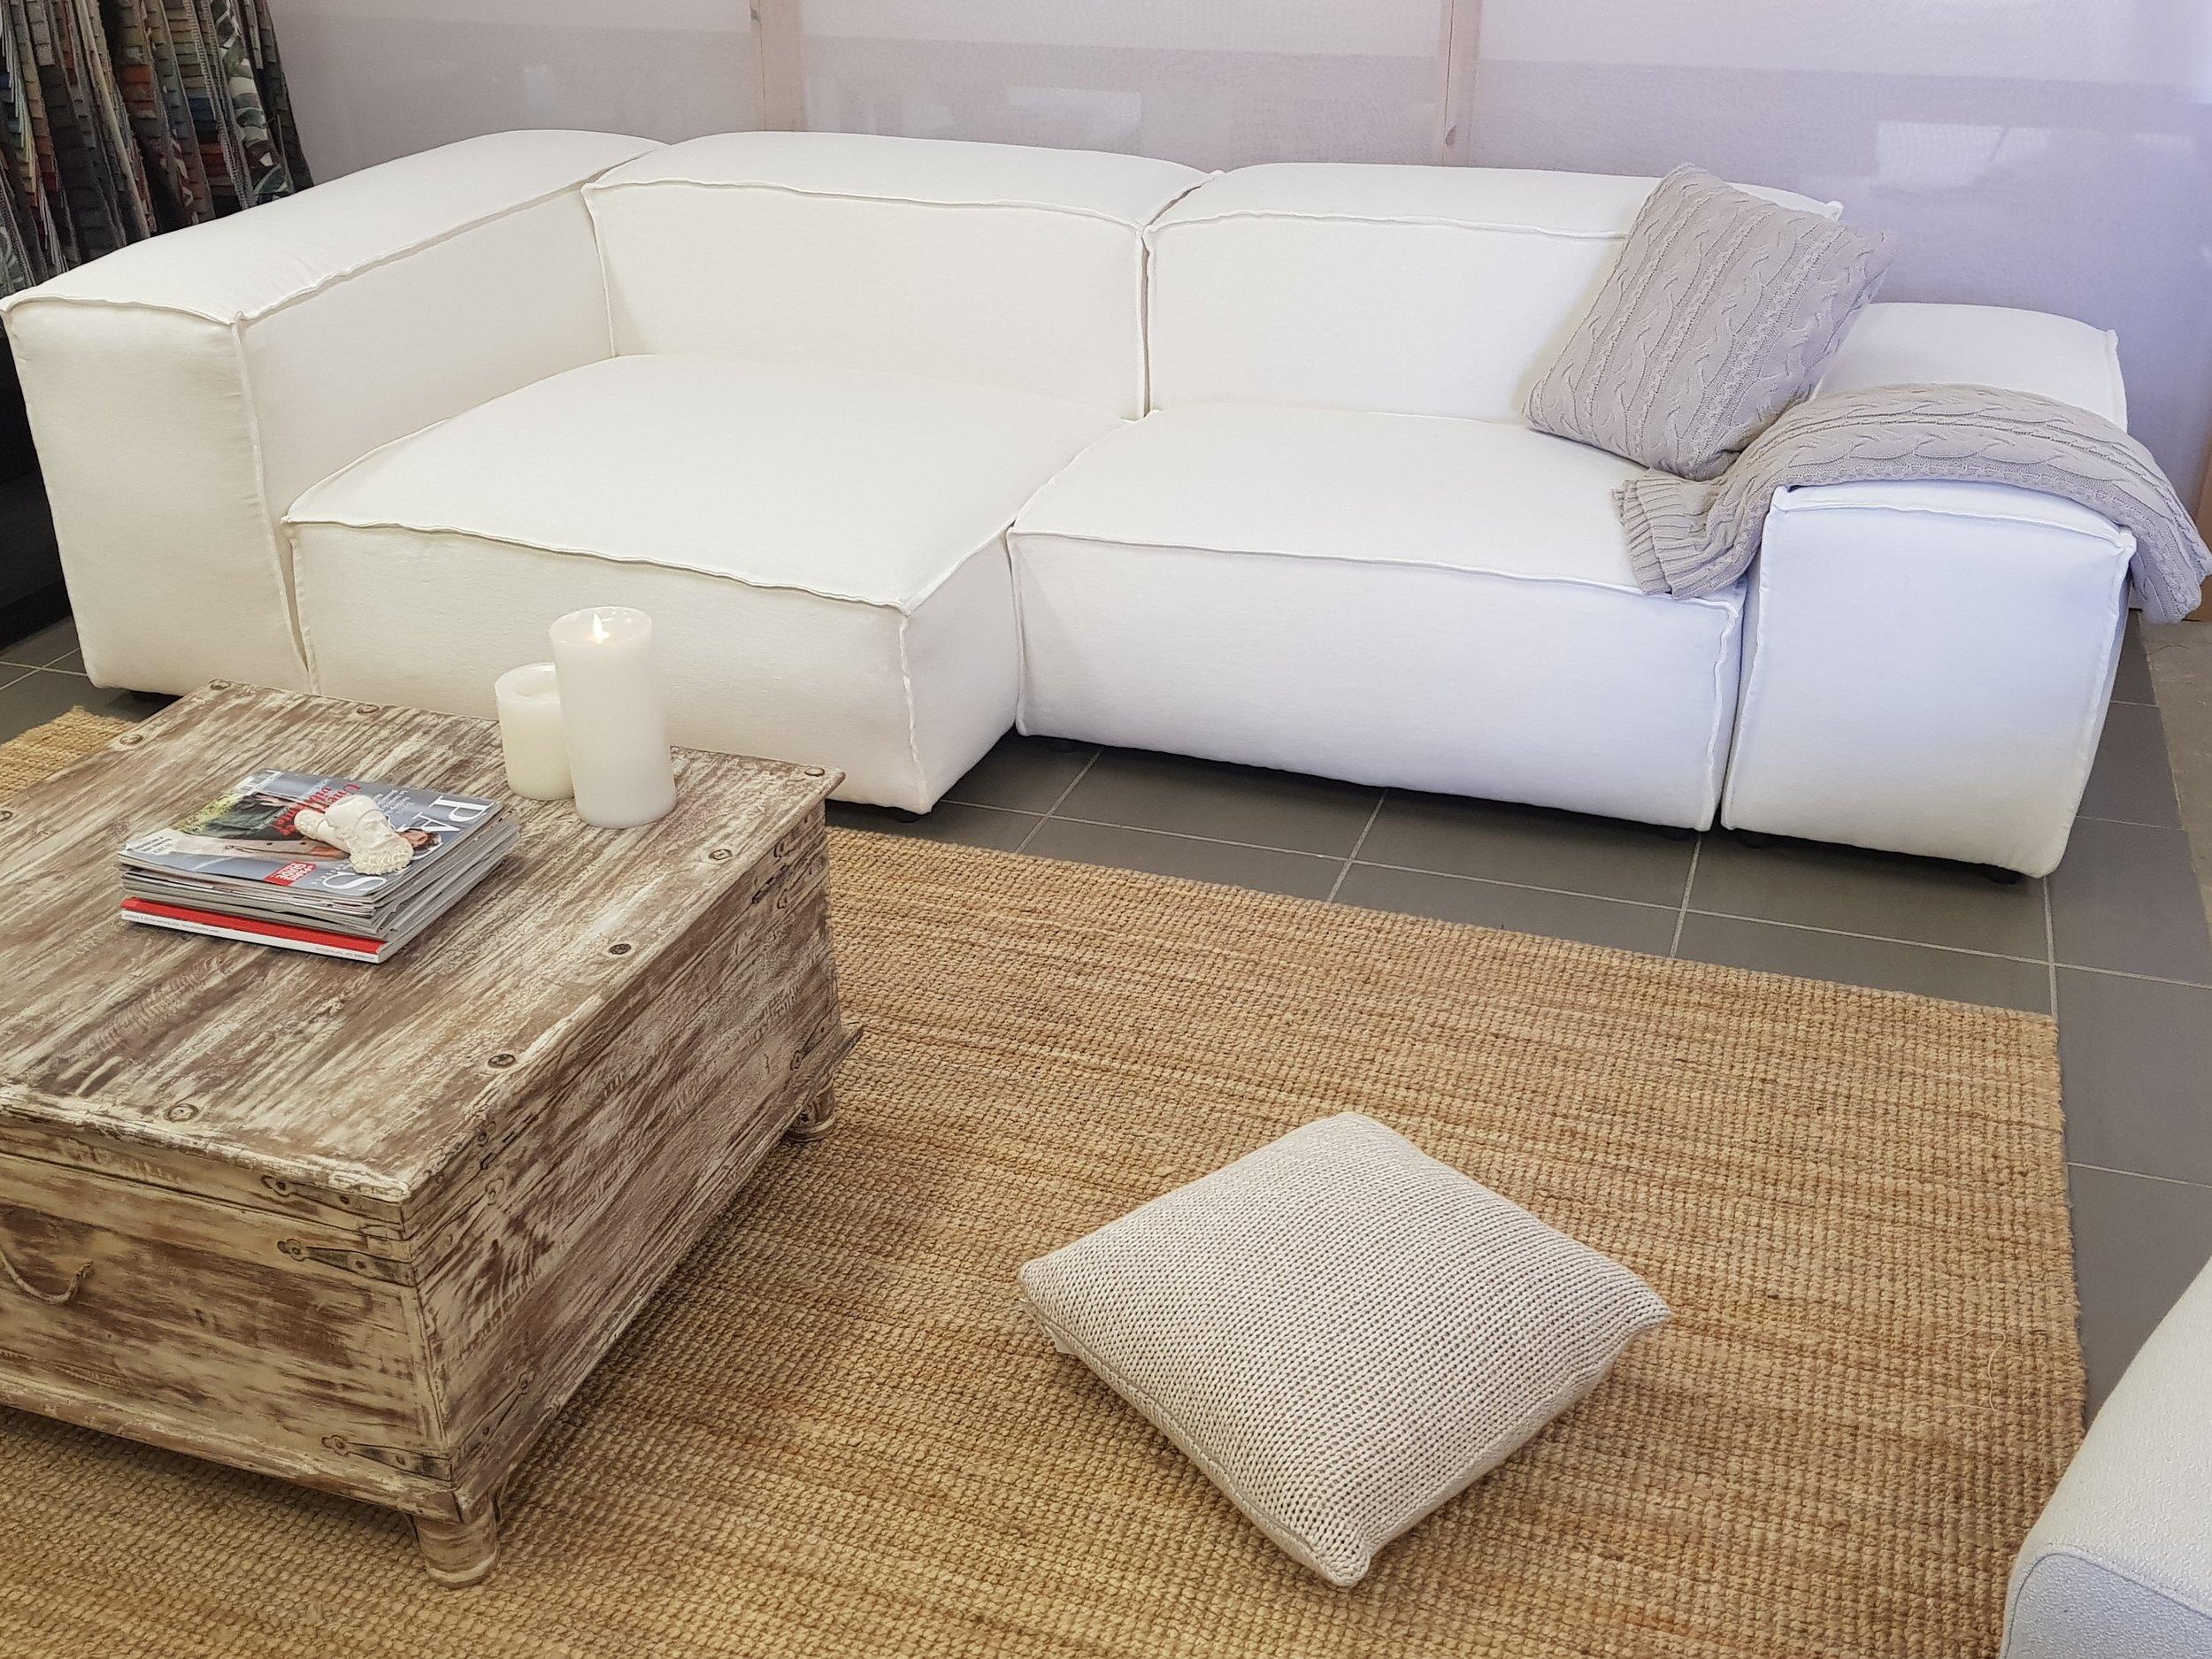 French seam Pod Sofa's